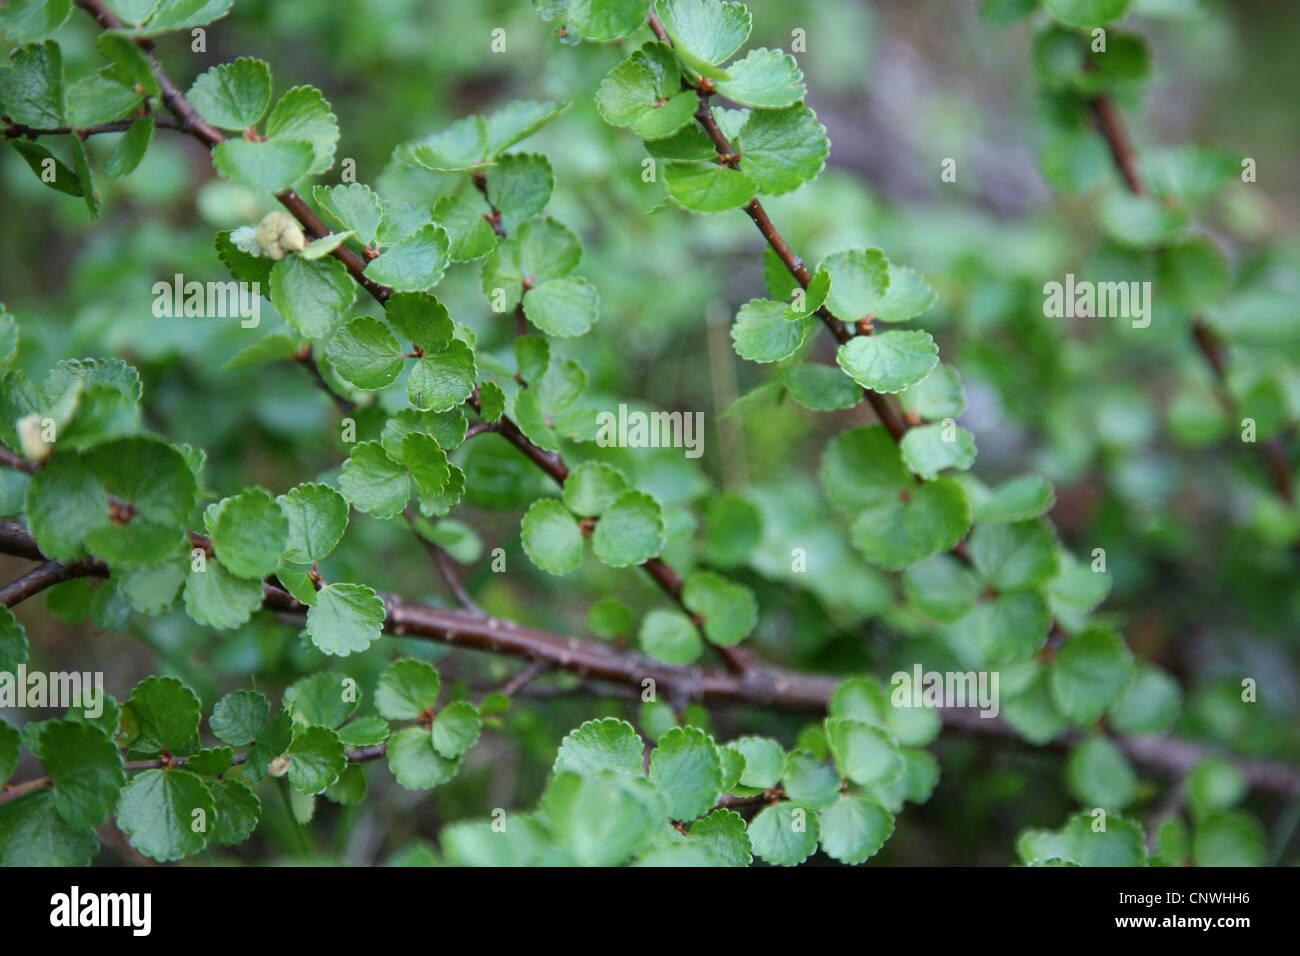 Dwarf Birch (Betula nana) in the Khibiny Mountains of the Kola Peninsula, Russia. - Stock Image